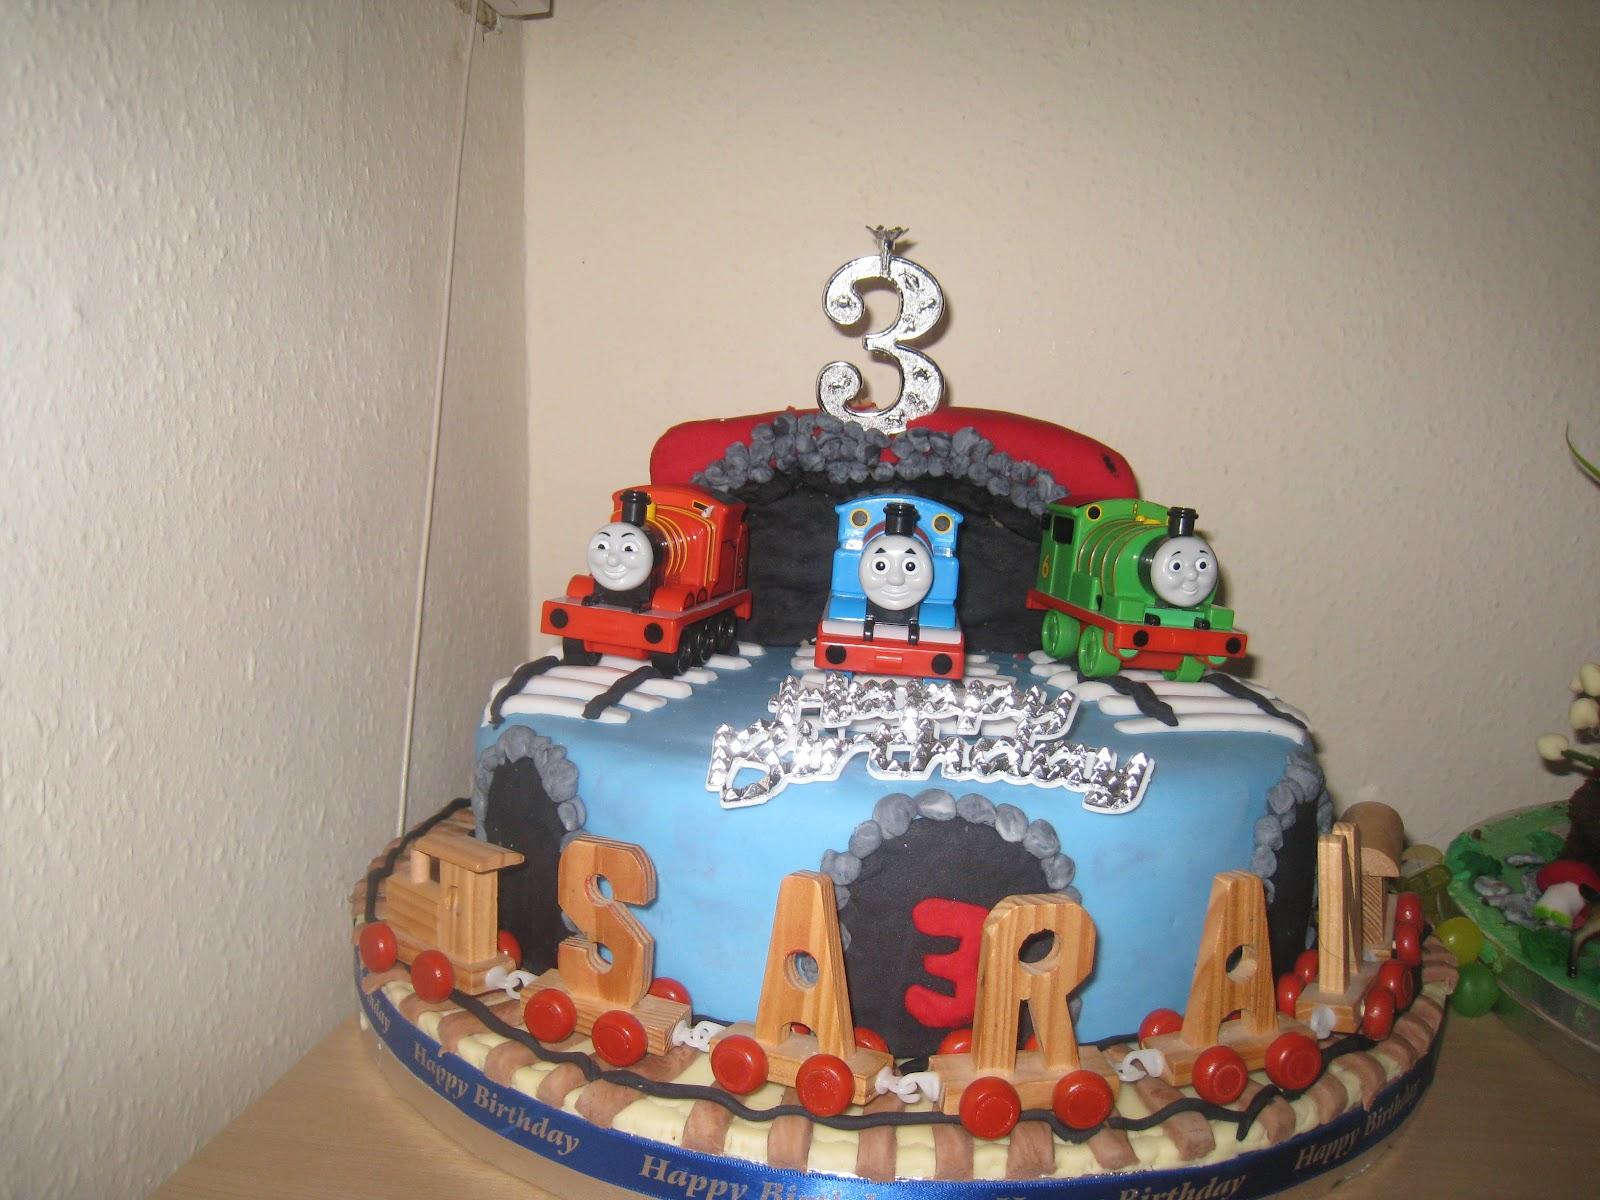 Rajany S Cake Decorations And Sugarcraft Thomas And